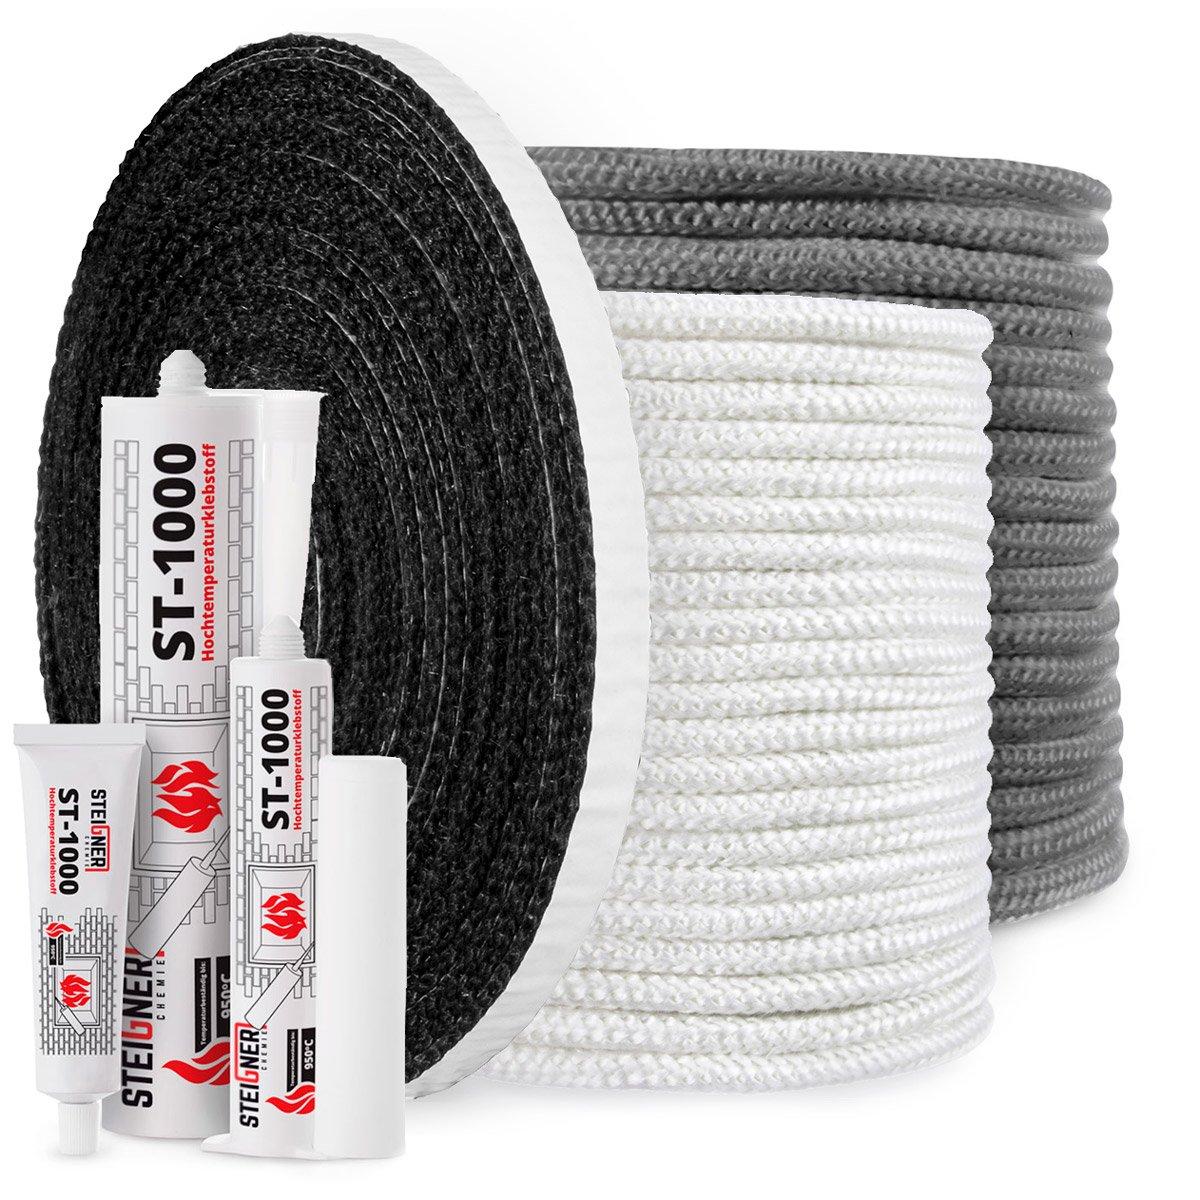 2 m STEIGNER Banda de Fibra de Vidrio de Chimenea SKD03 Negro sellador resiste al calor hasta 550/°C 10x2mm